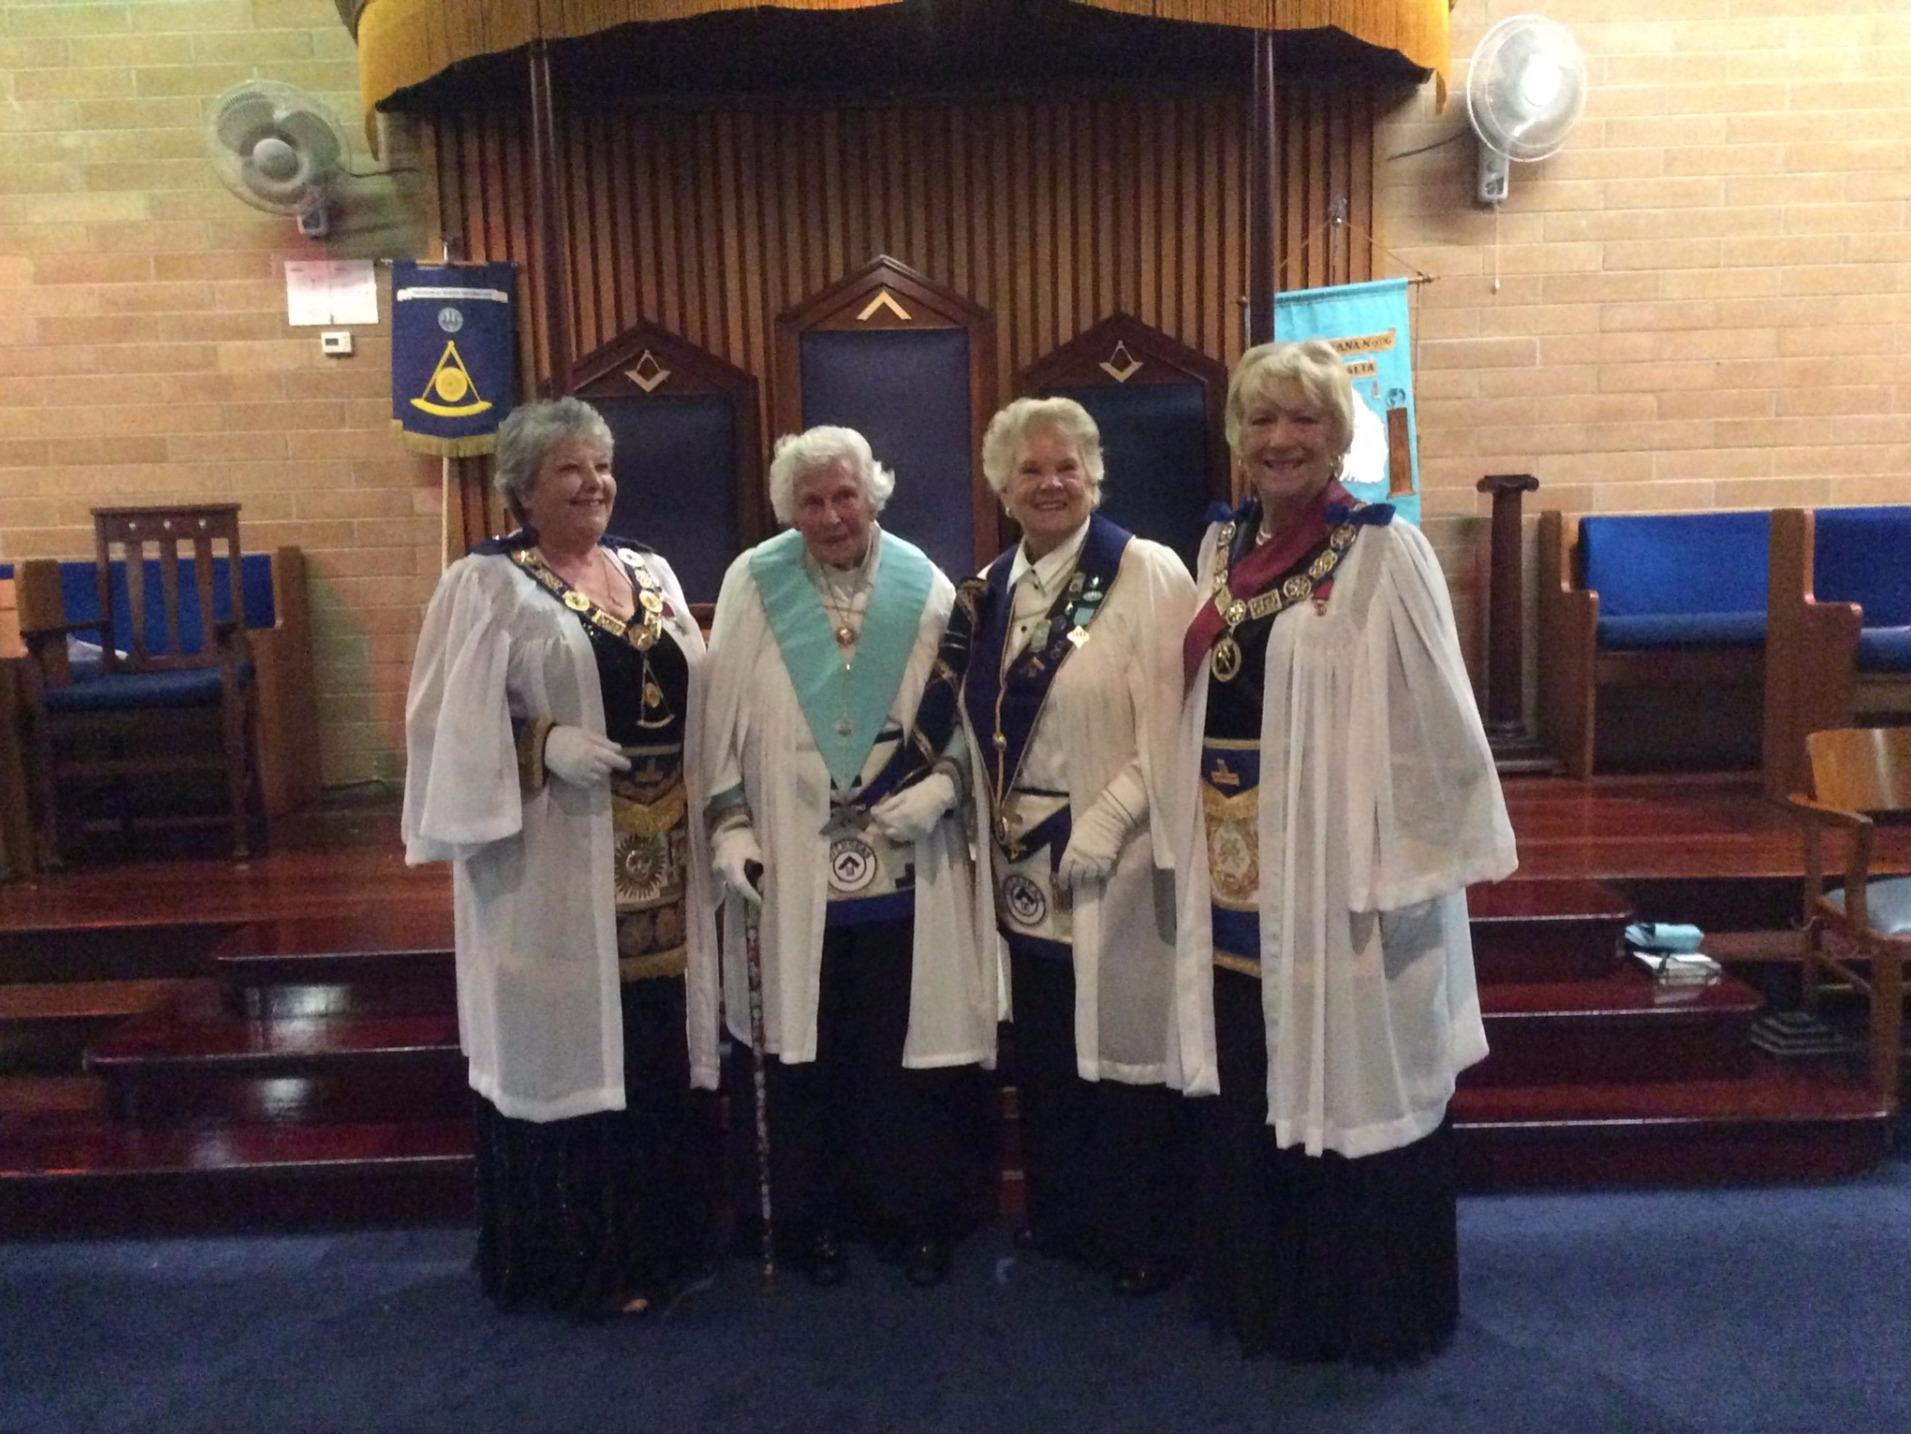 Locations | The Order of Women Freemasons